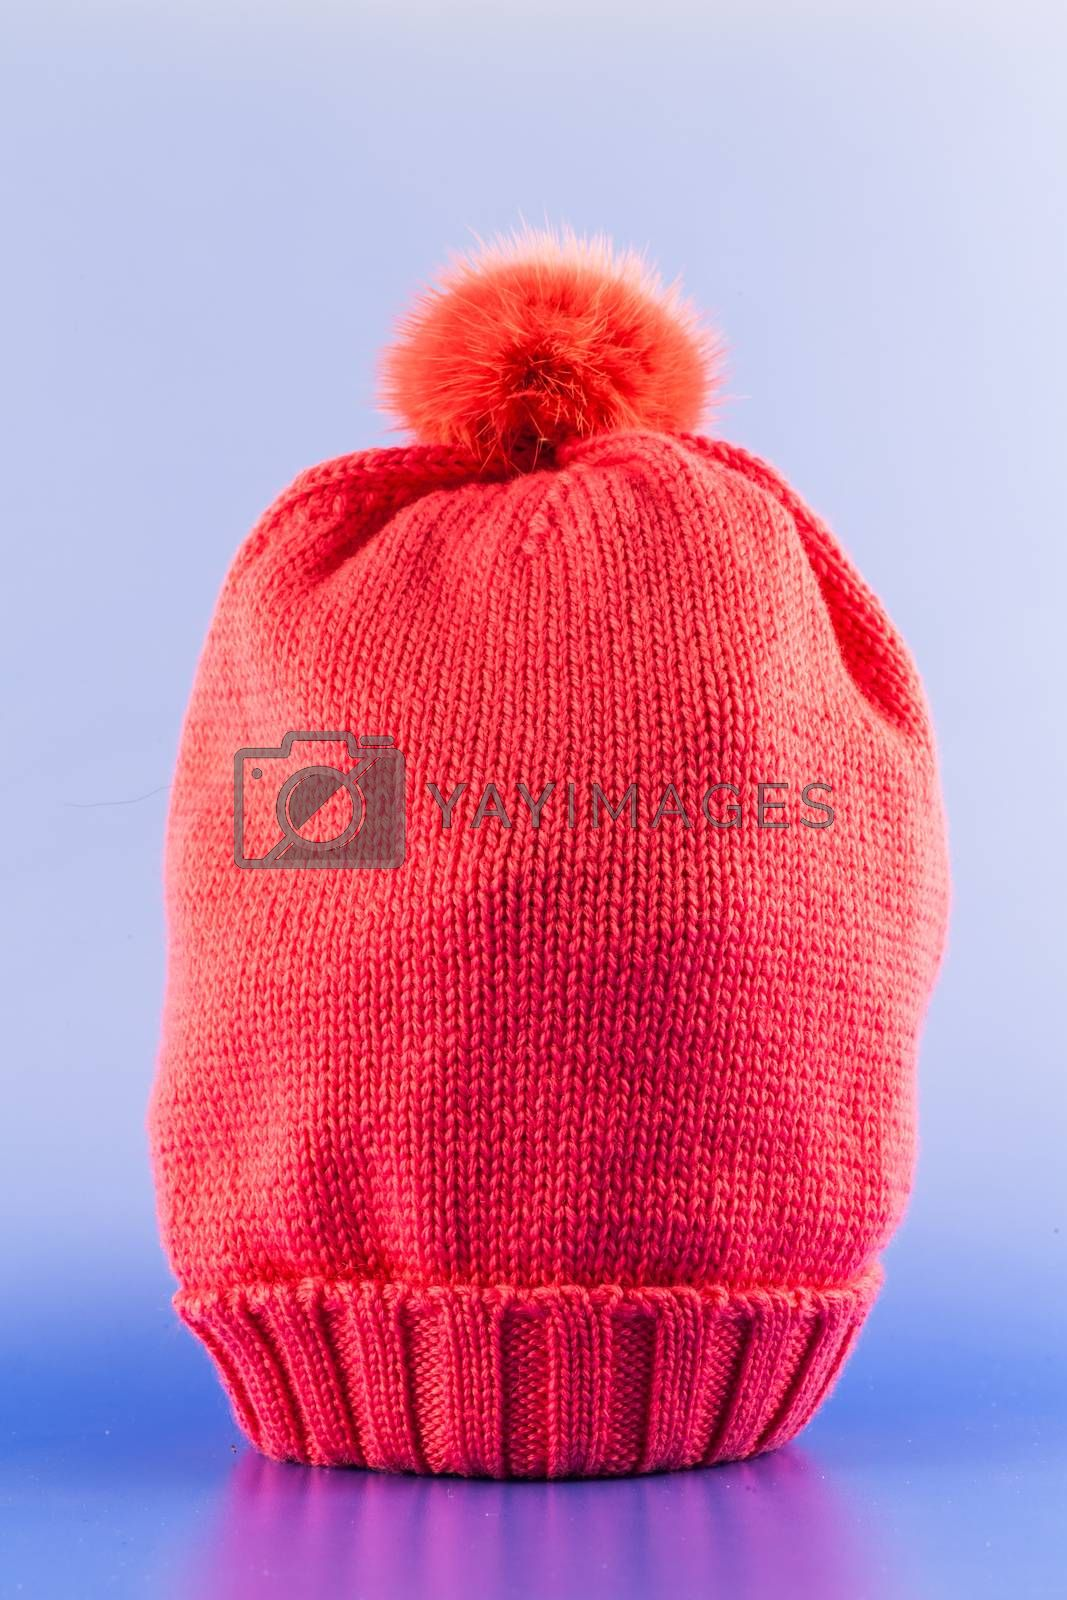 Royalty free image of Handmade Wool Hat by Perseomedusa